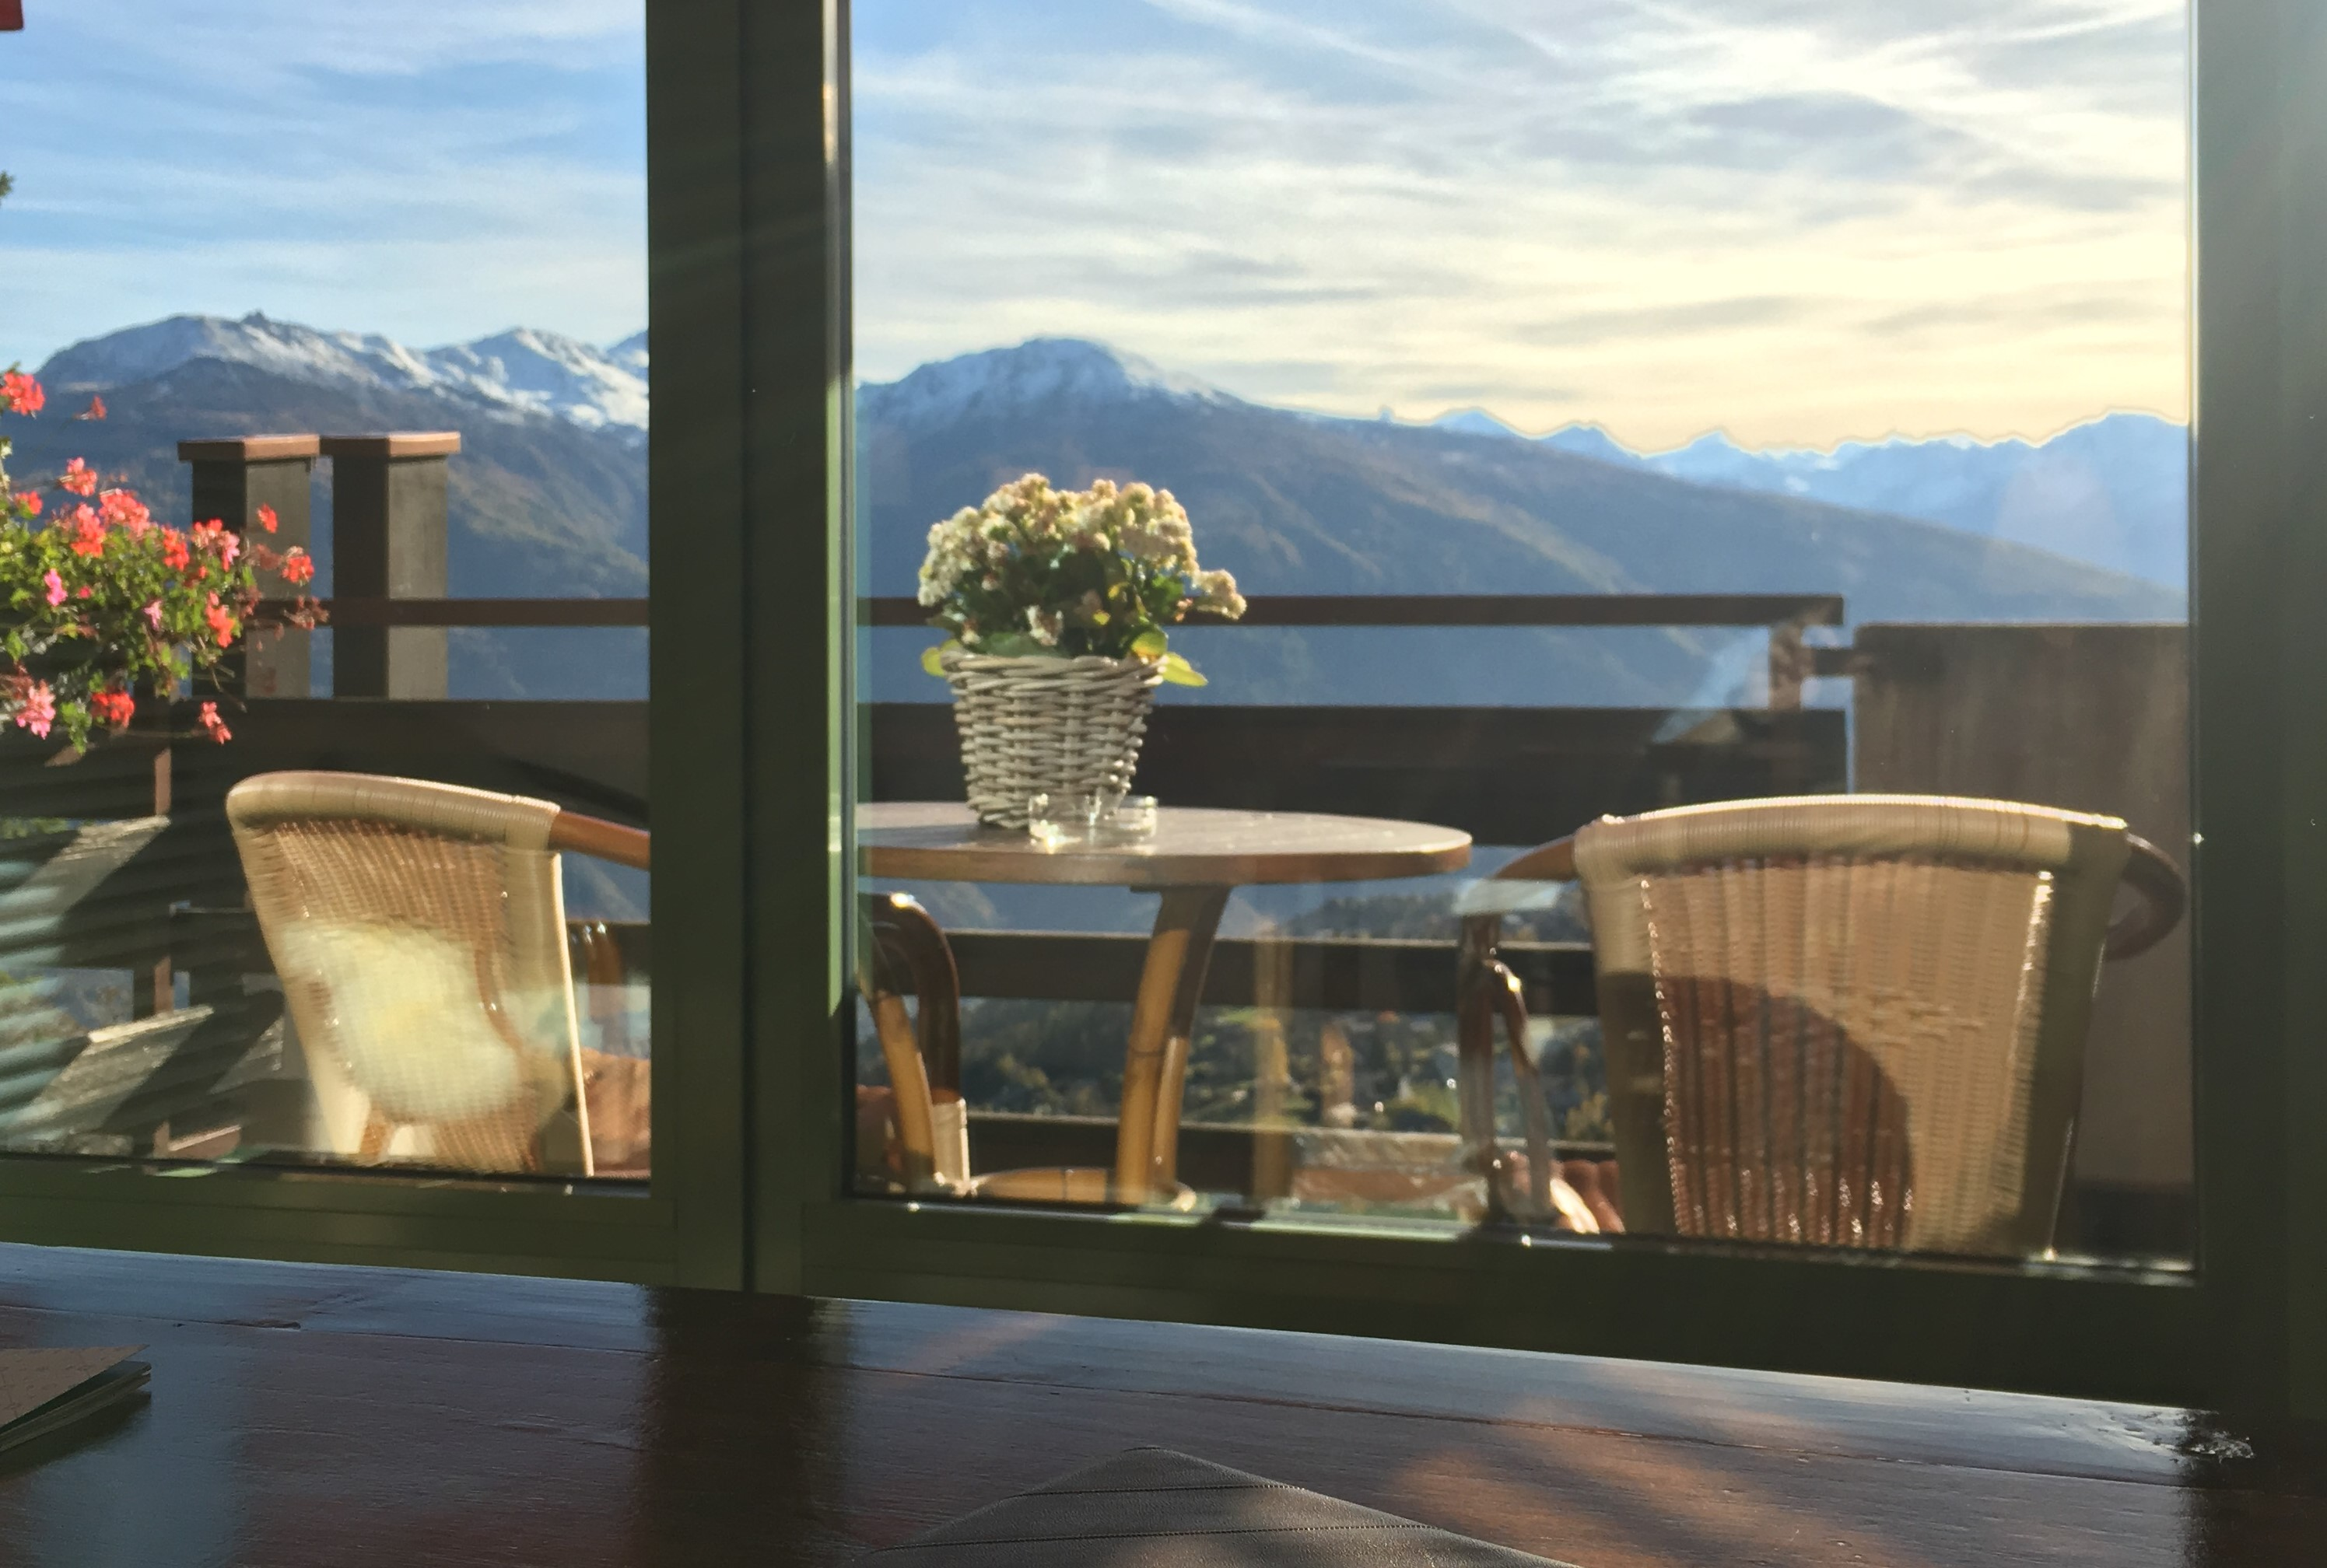 Hotel de la Forêt in Crans-Montana